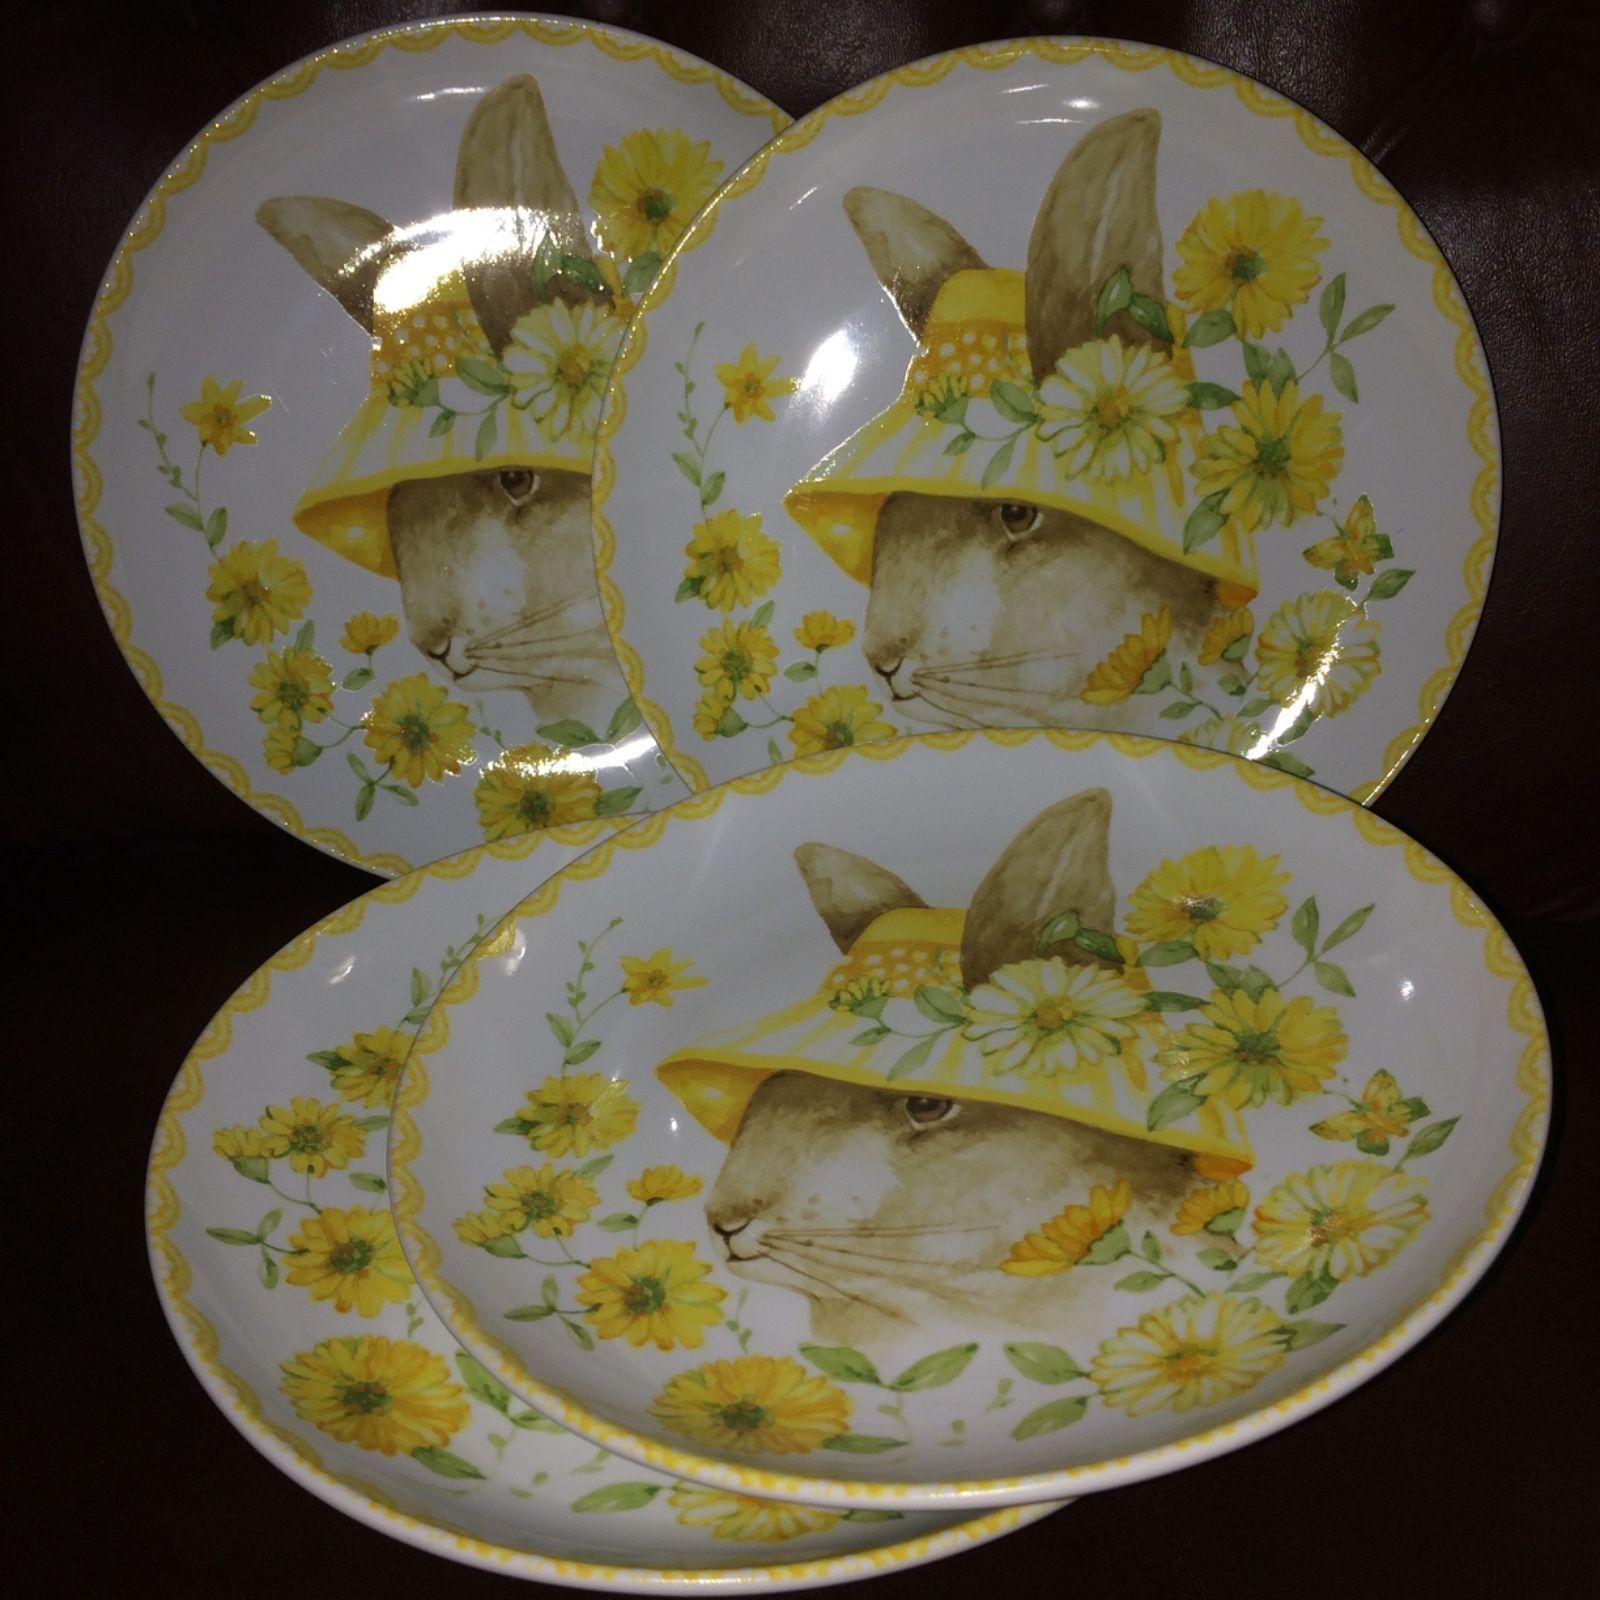 222 Fifth Easter Bunny Rabbit Floral Appetizer Dessert Plates Ice Cream Bowl Set